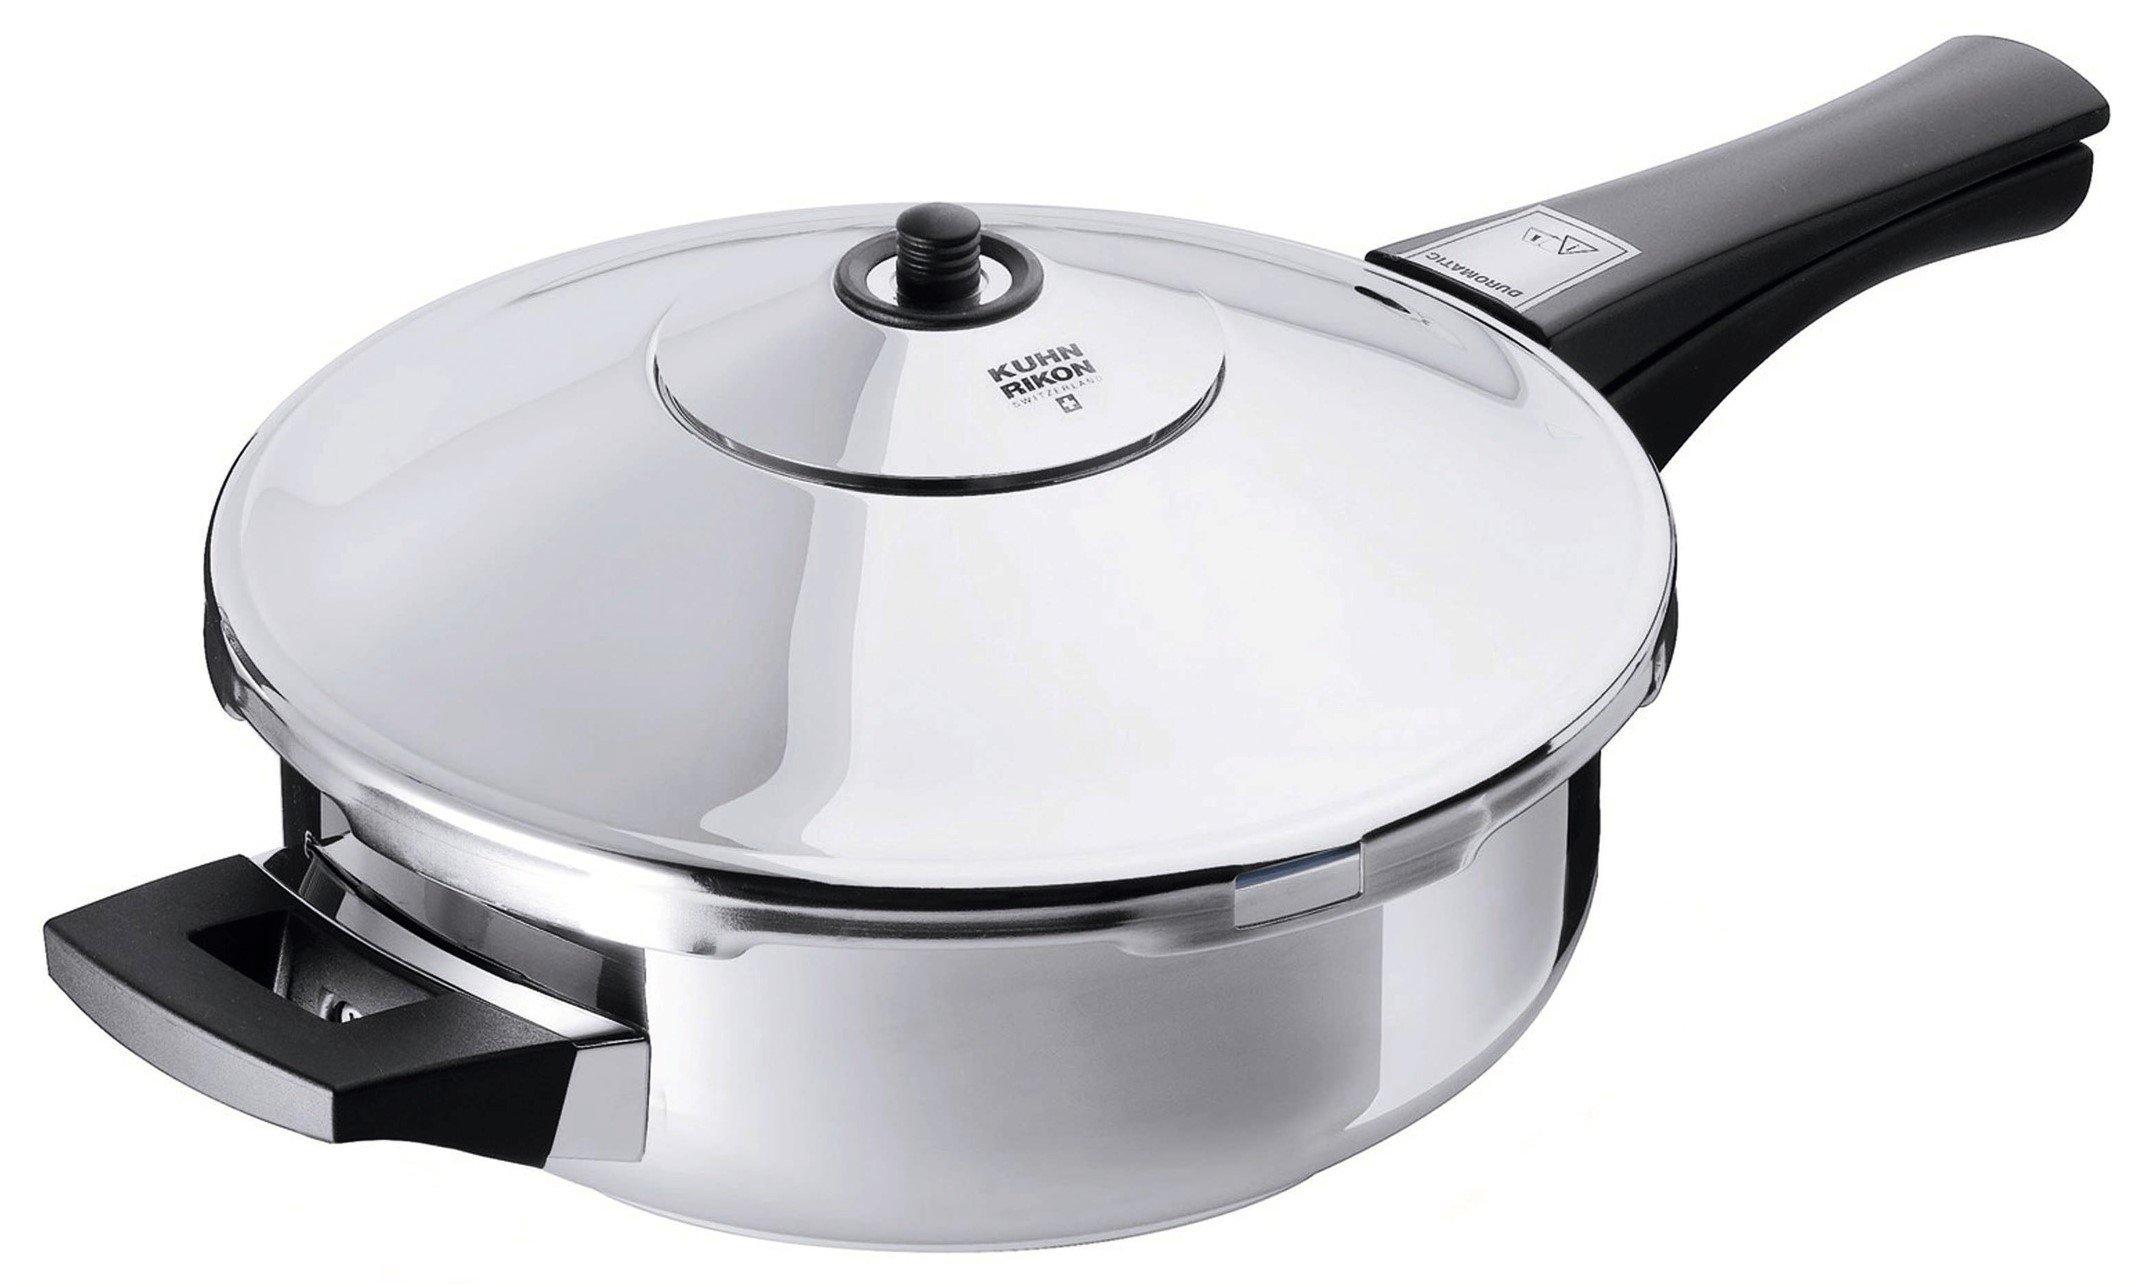 Kuhn Rikon Duromatic Energy Efficient Pressure Cooker - Frying Pan